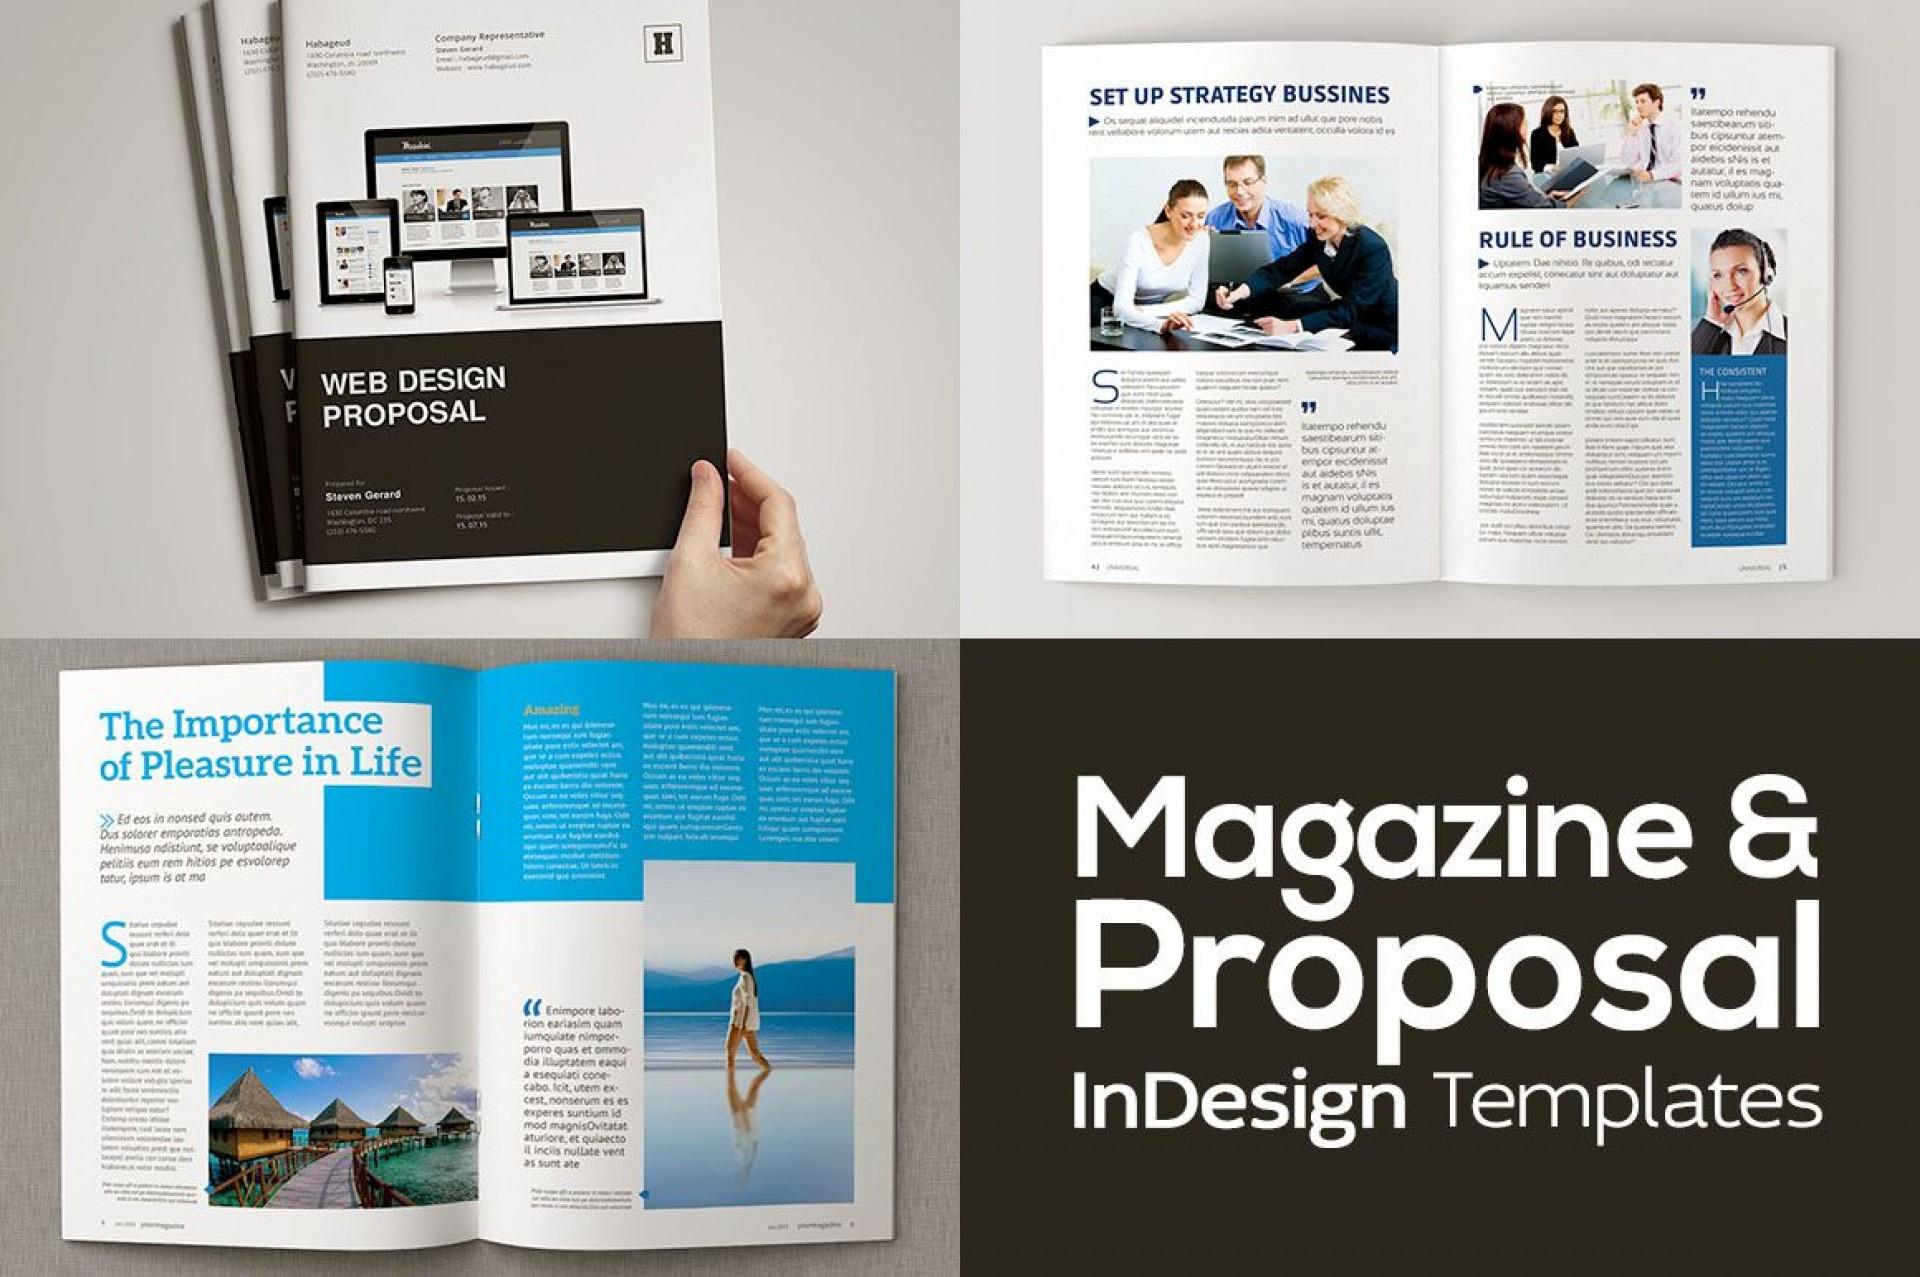 002 Incredible Web Design Proposal Template Indesign 1920